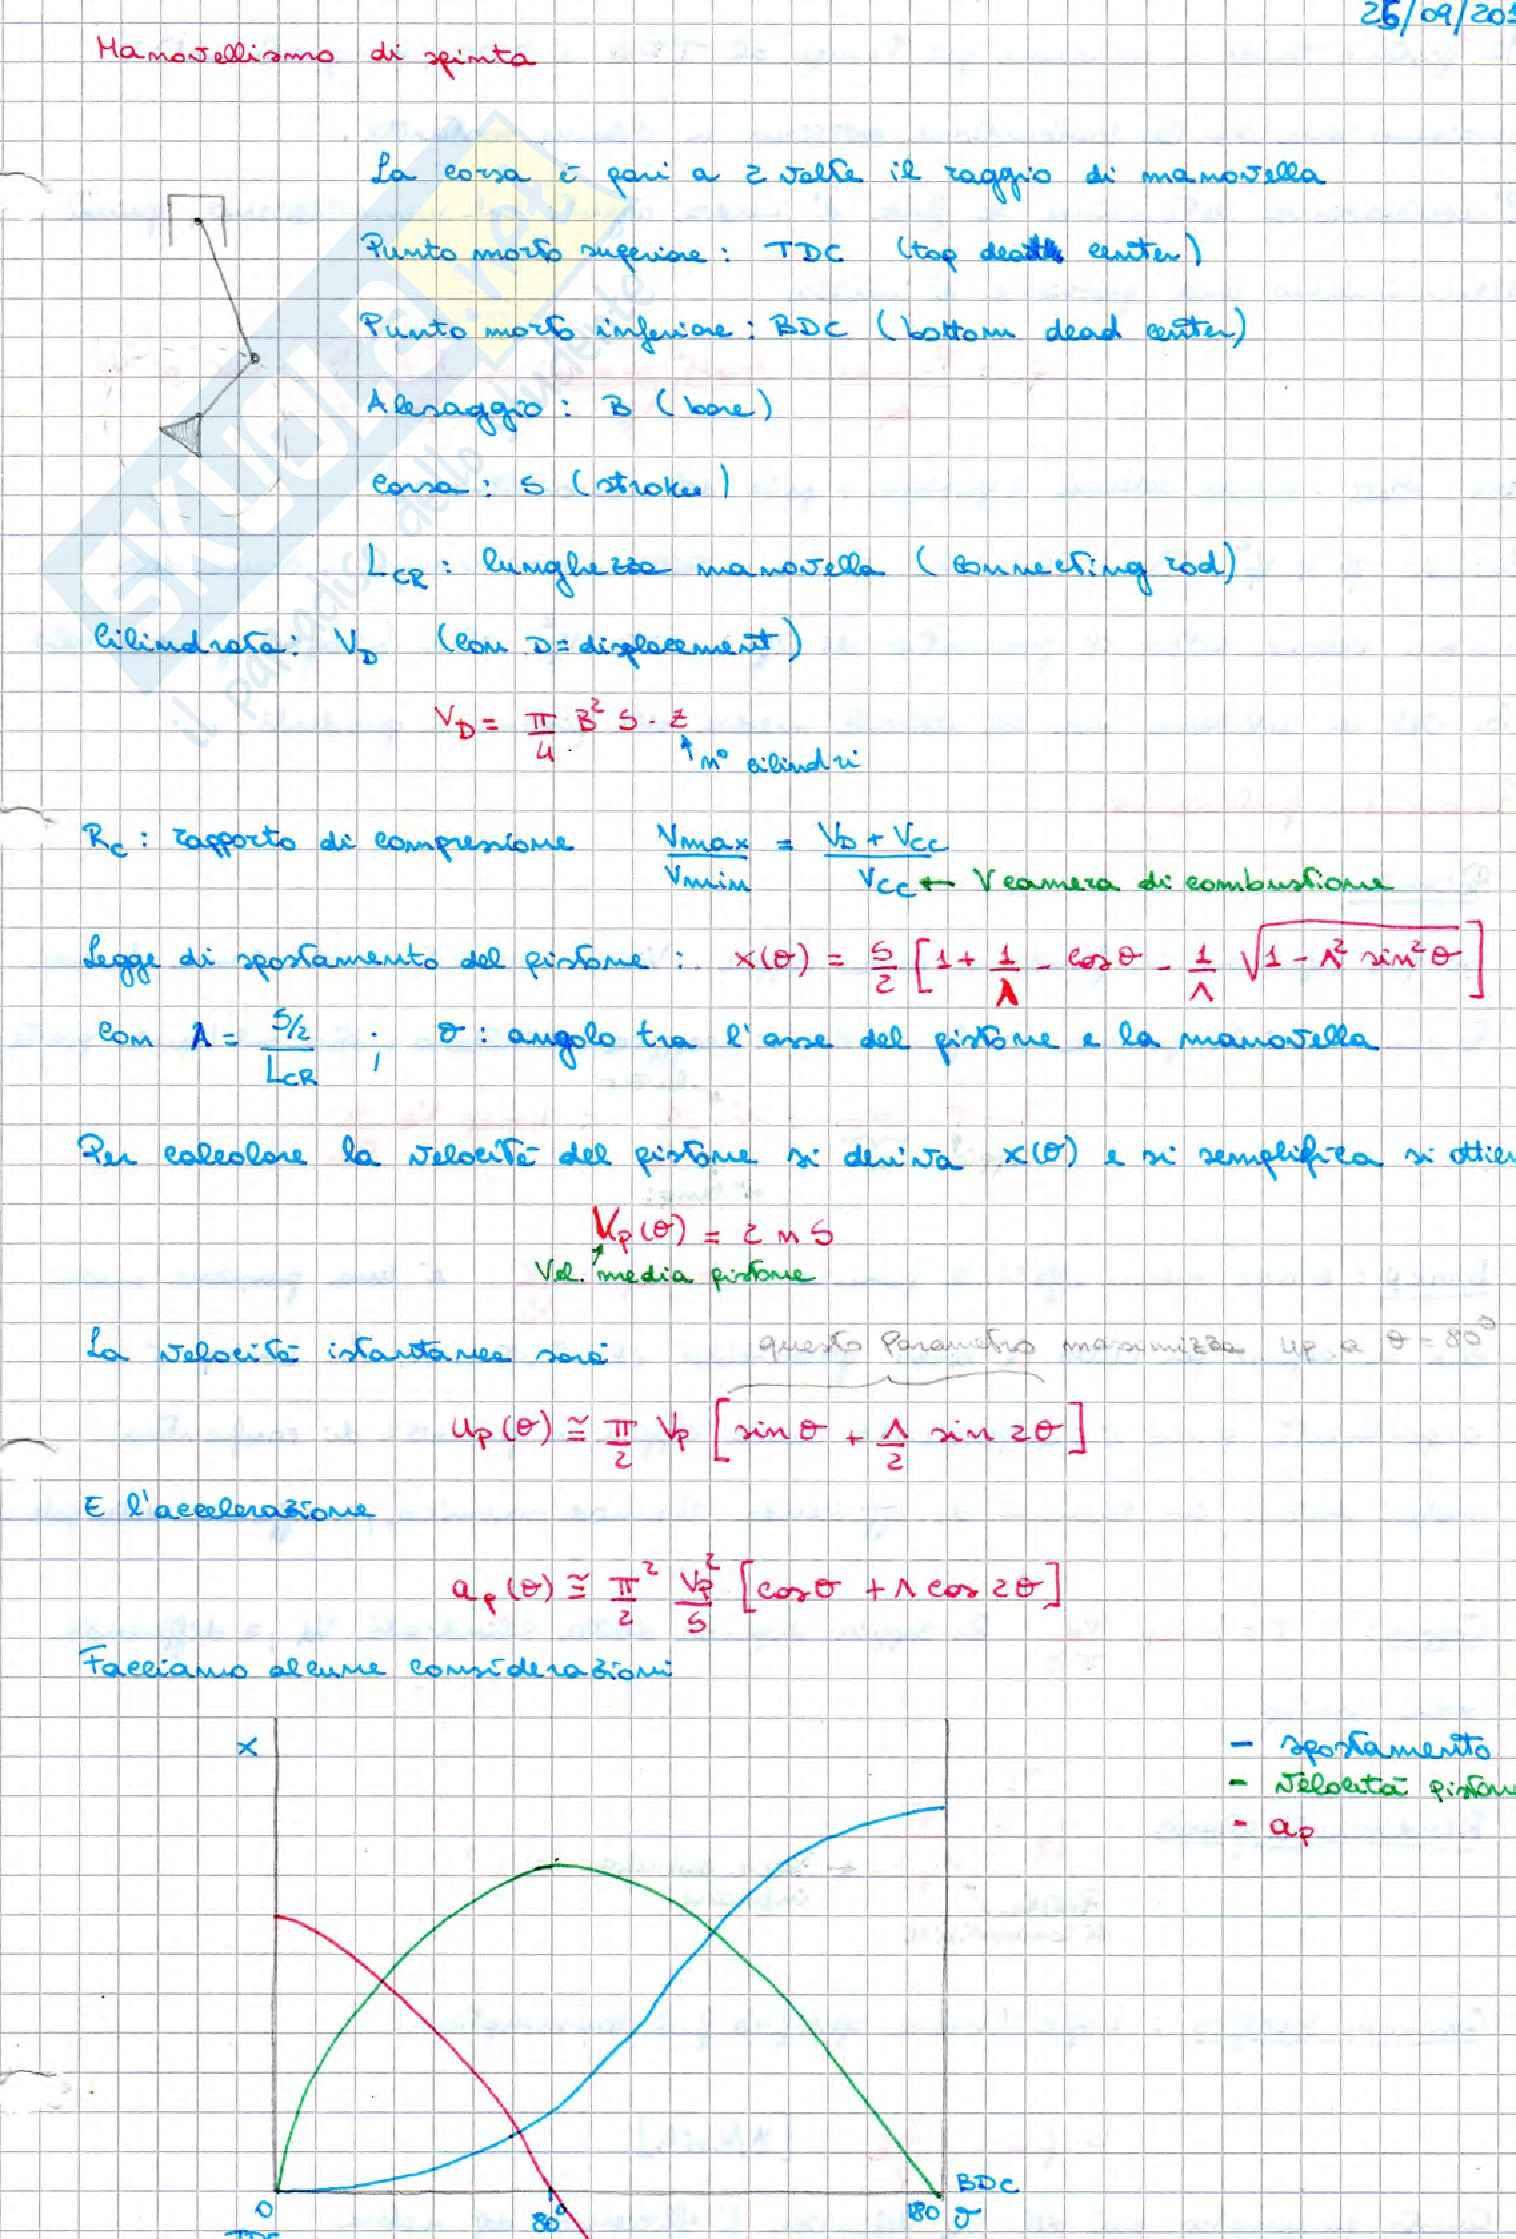 Motori a Combustione Interna - Appunti completi